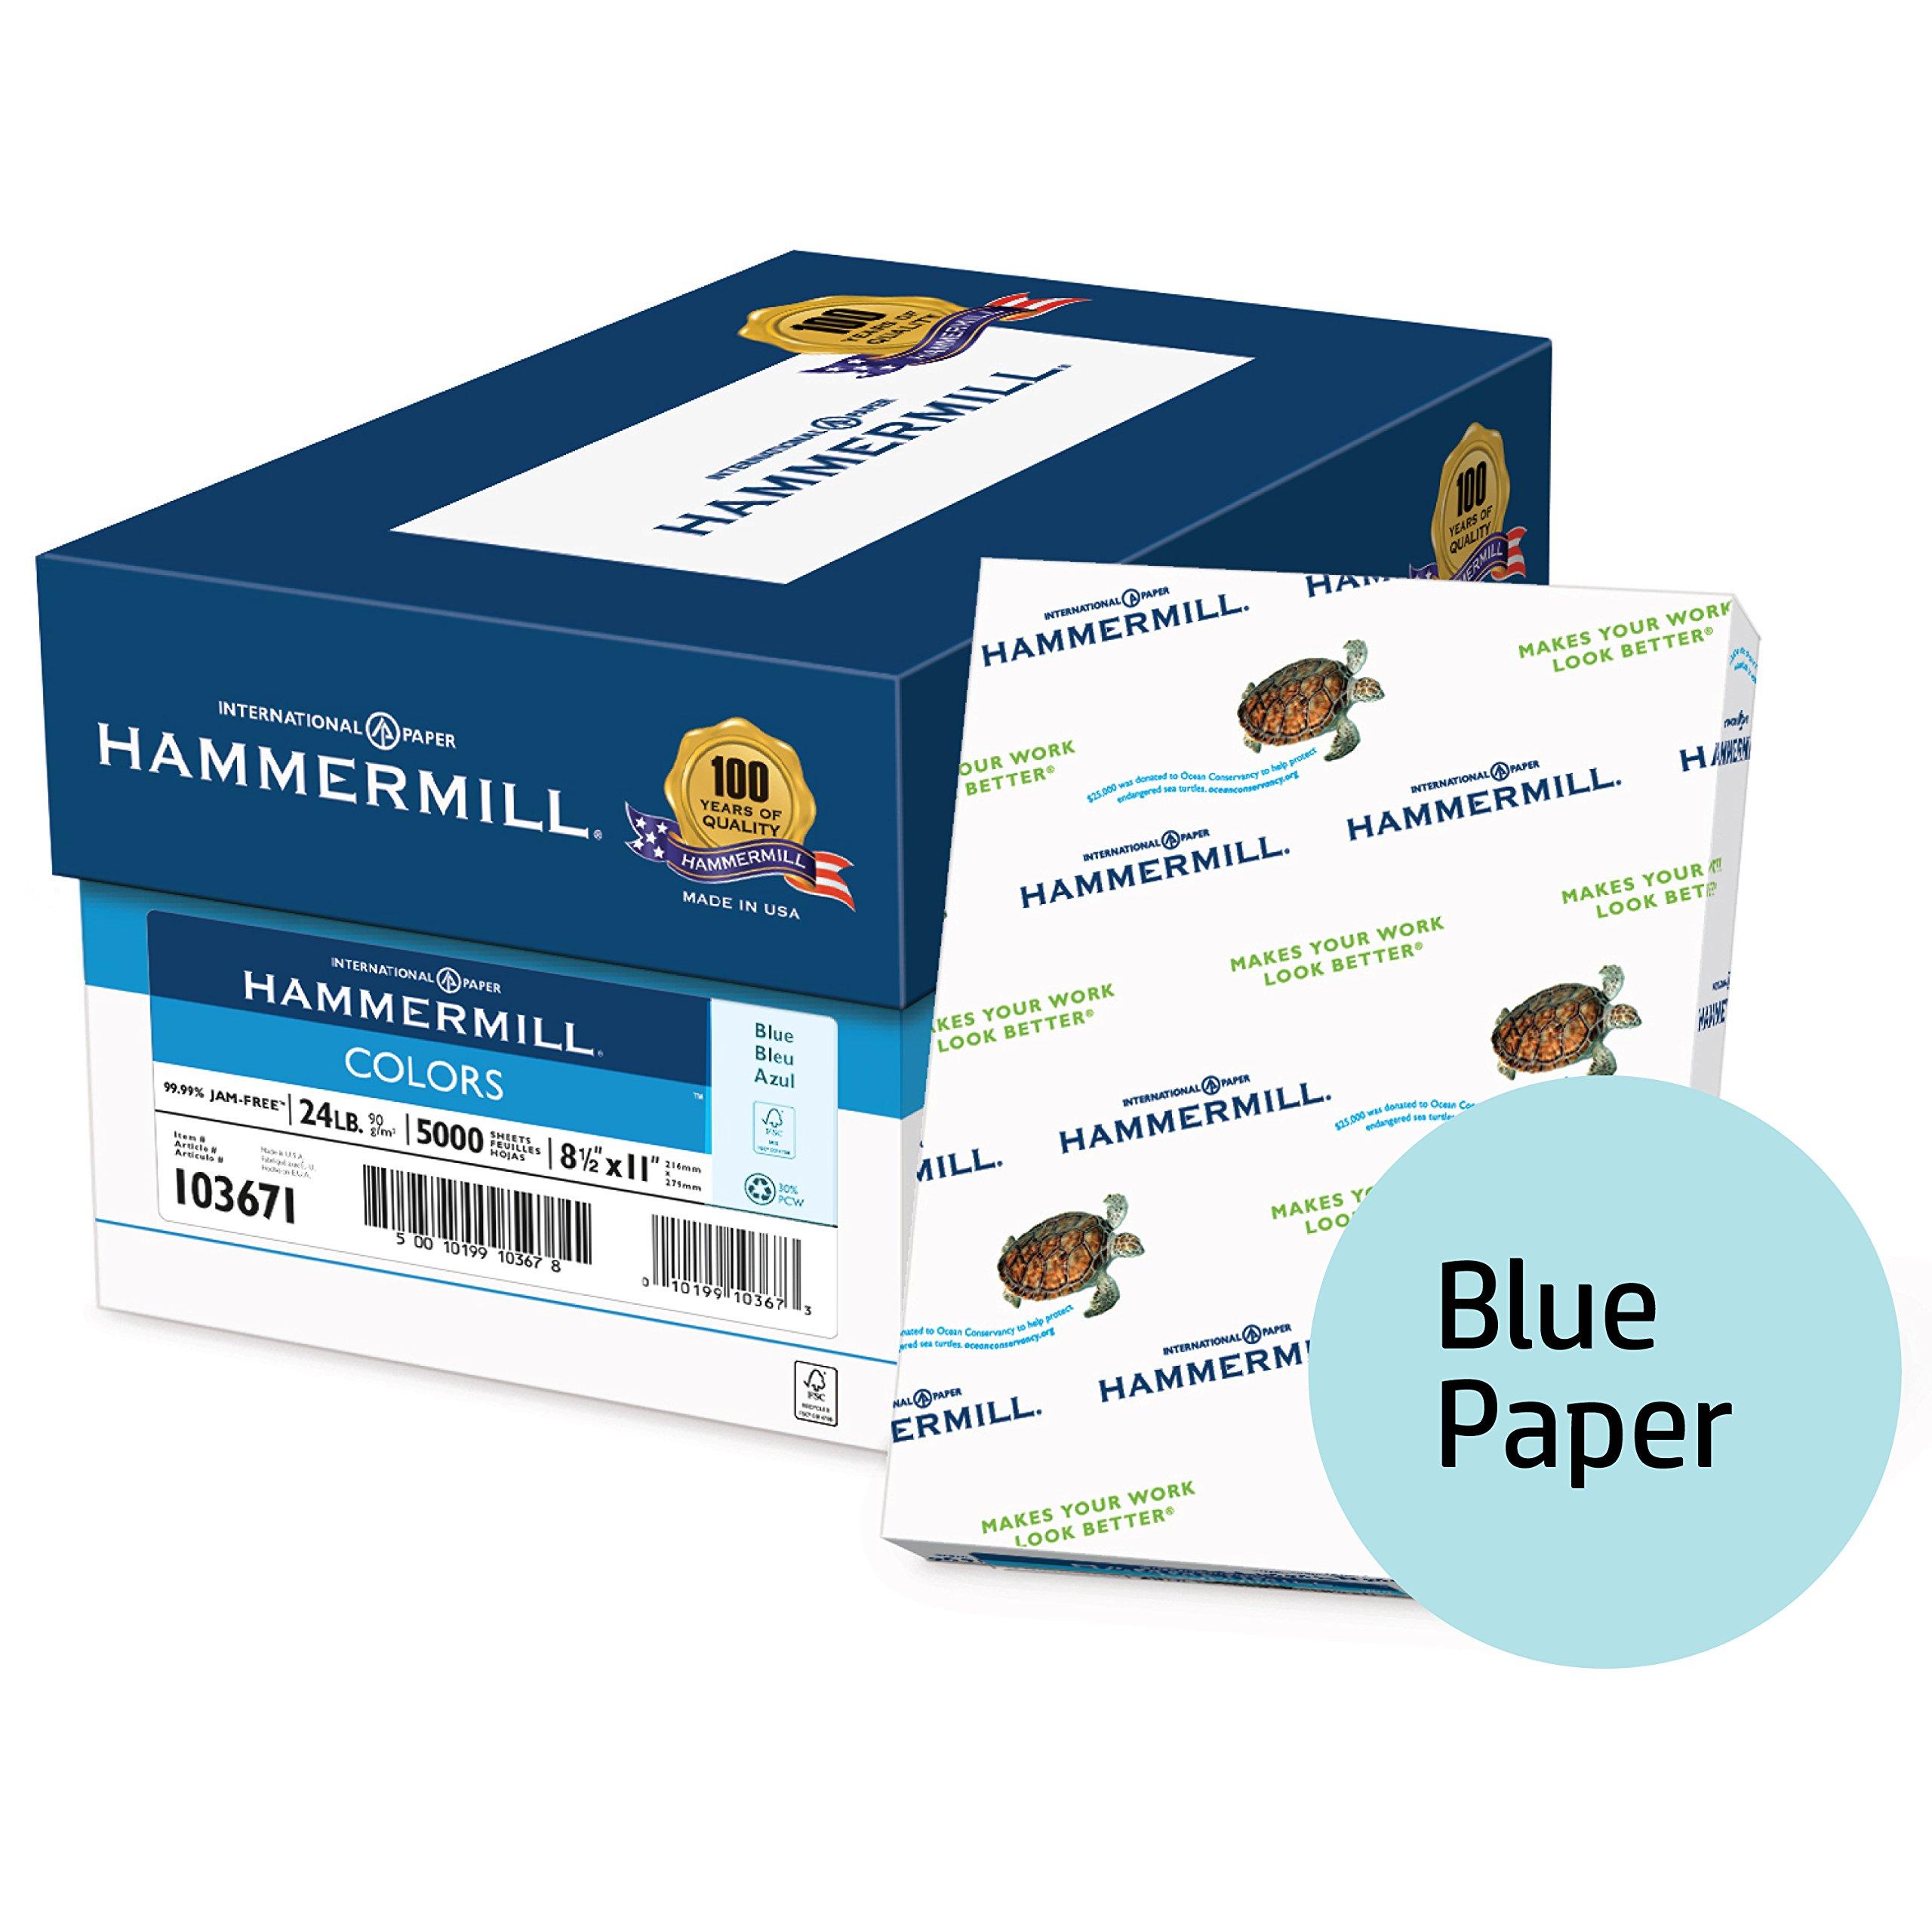 Hammermill Colored Paper, Blue Printer Paper, 24lb, 8.5x11 Paper, Letter Size, 5,000 sheets / 10 Ream Case, Pastel Paper, Colorful Paper (103671C)